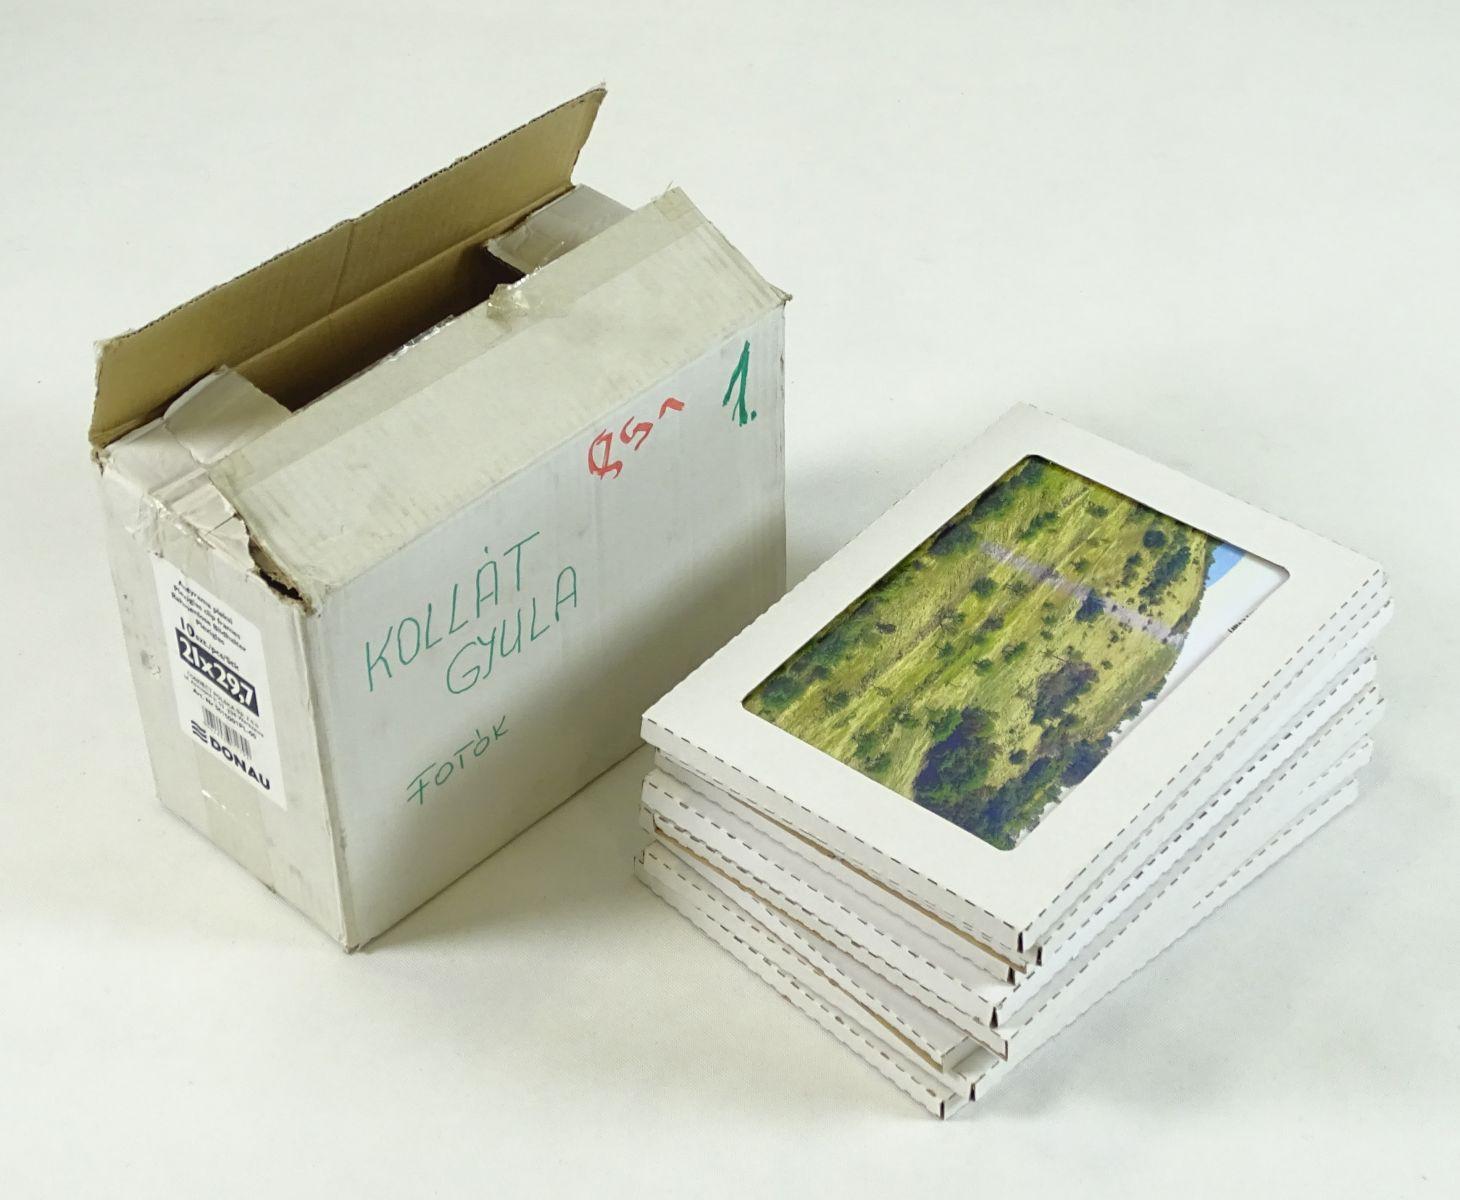 DSC05560.JPG (1460×1200)